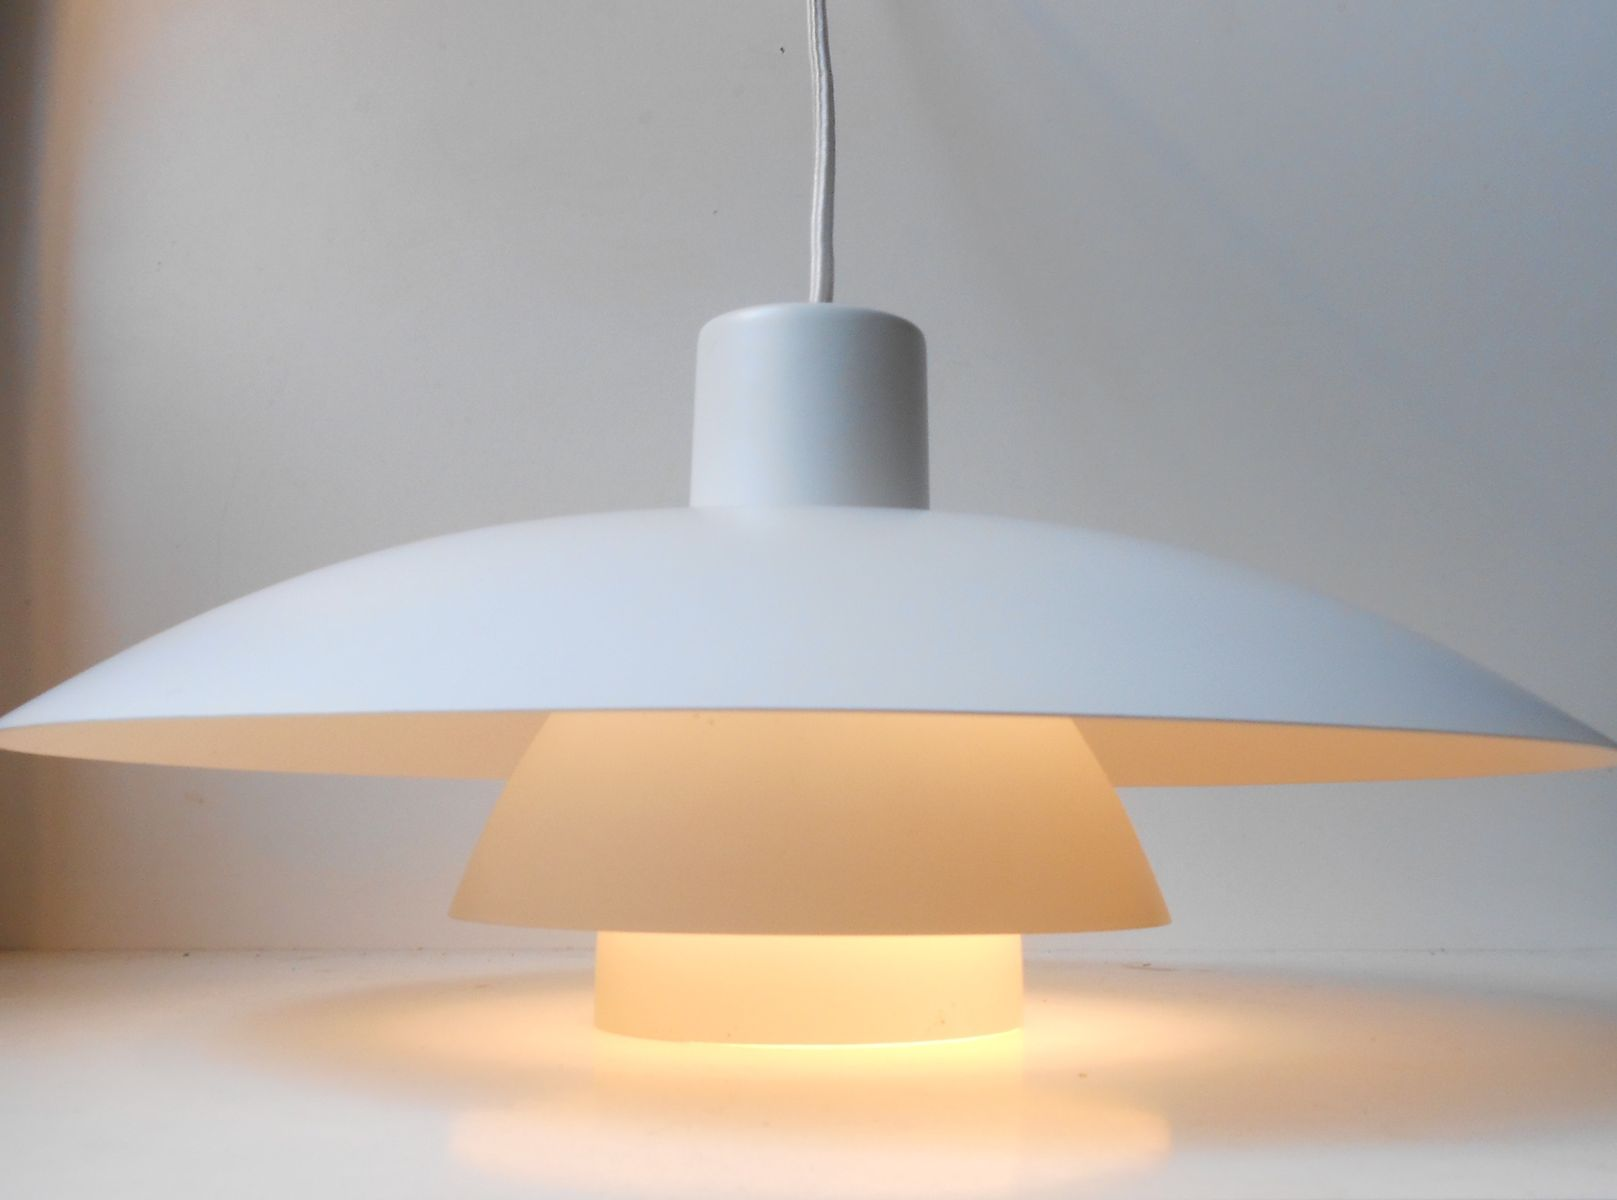 ph 4 3 pendant lamps by poul henningsen for louis poulsen. Black Bedroom Furniture Sets. Home Design Ideas